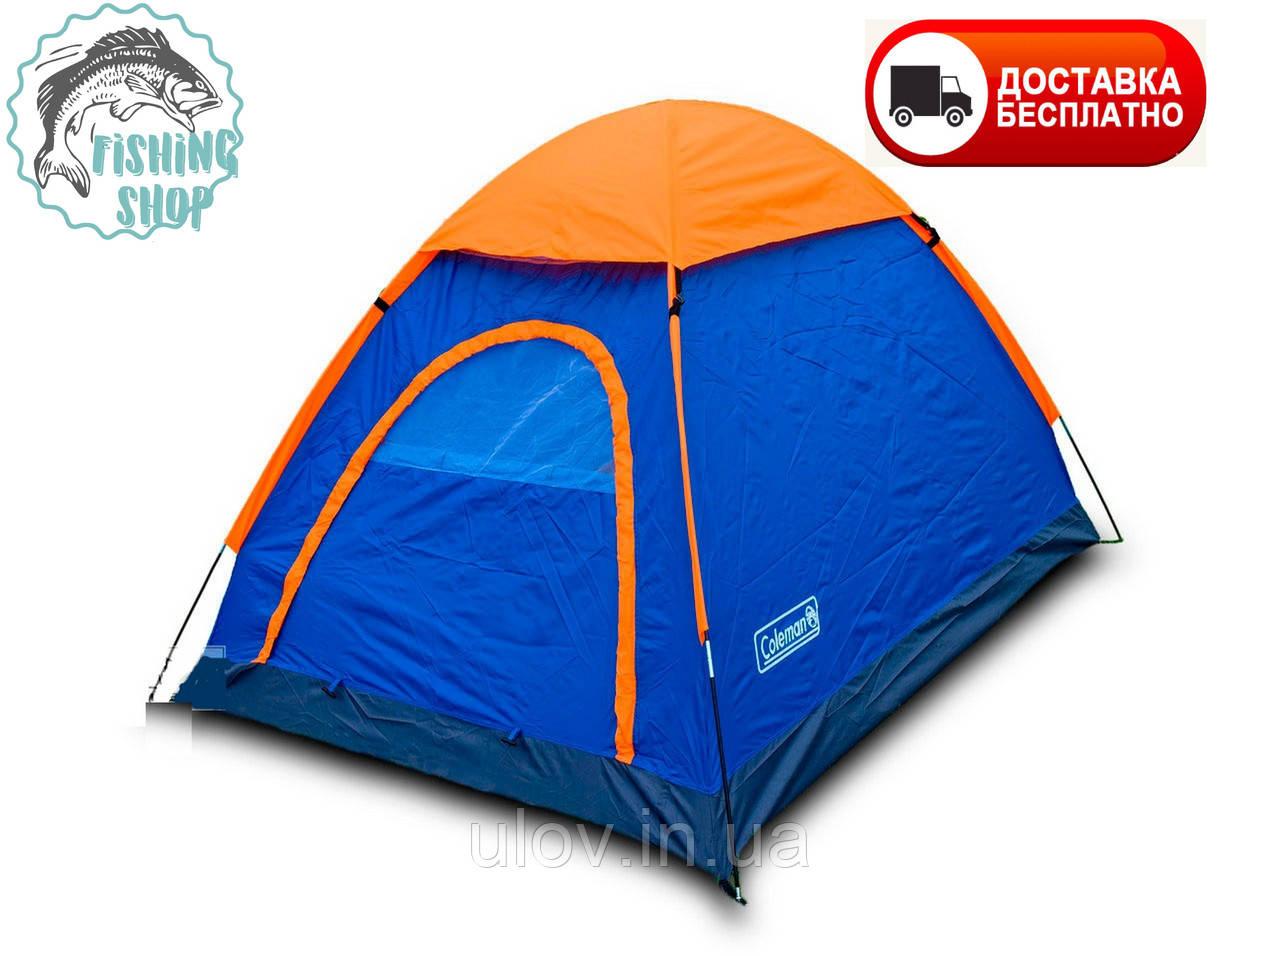 Палатка 2-х местная Coleman (Колеман) 3005